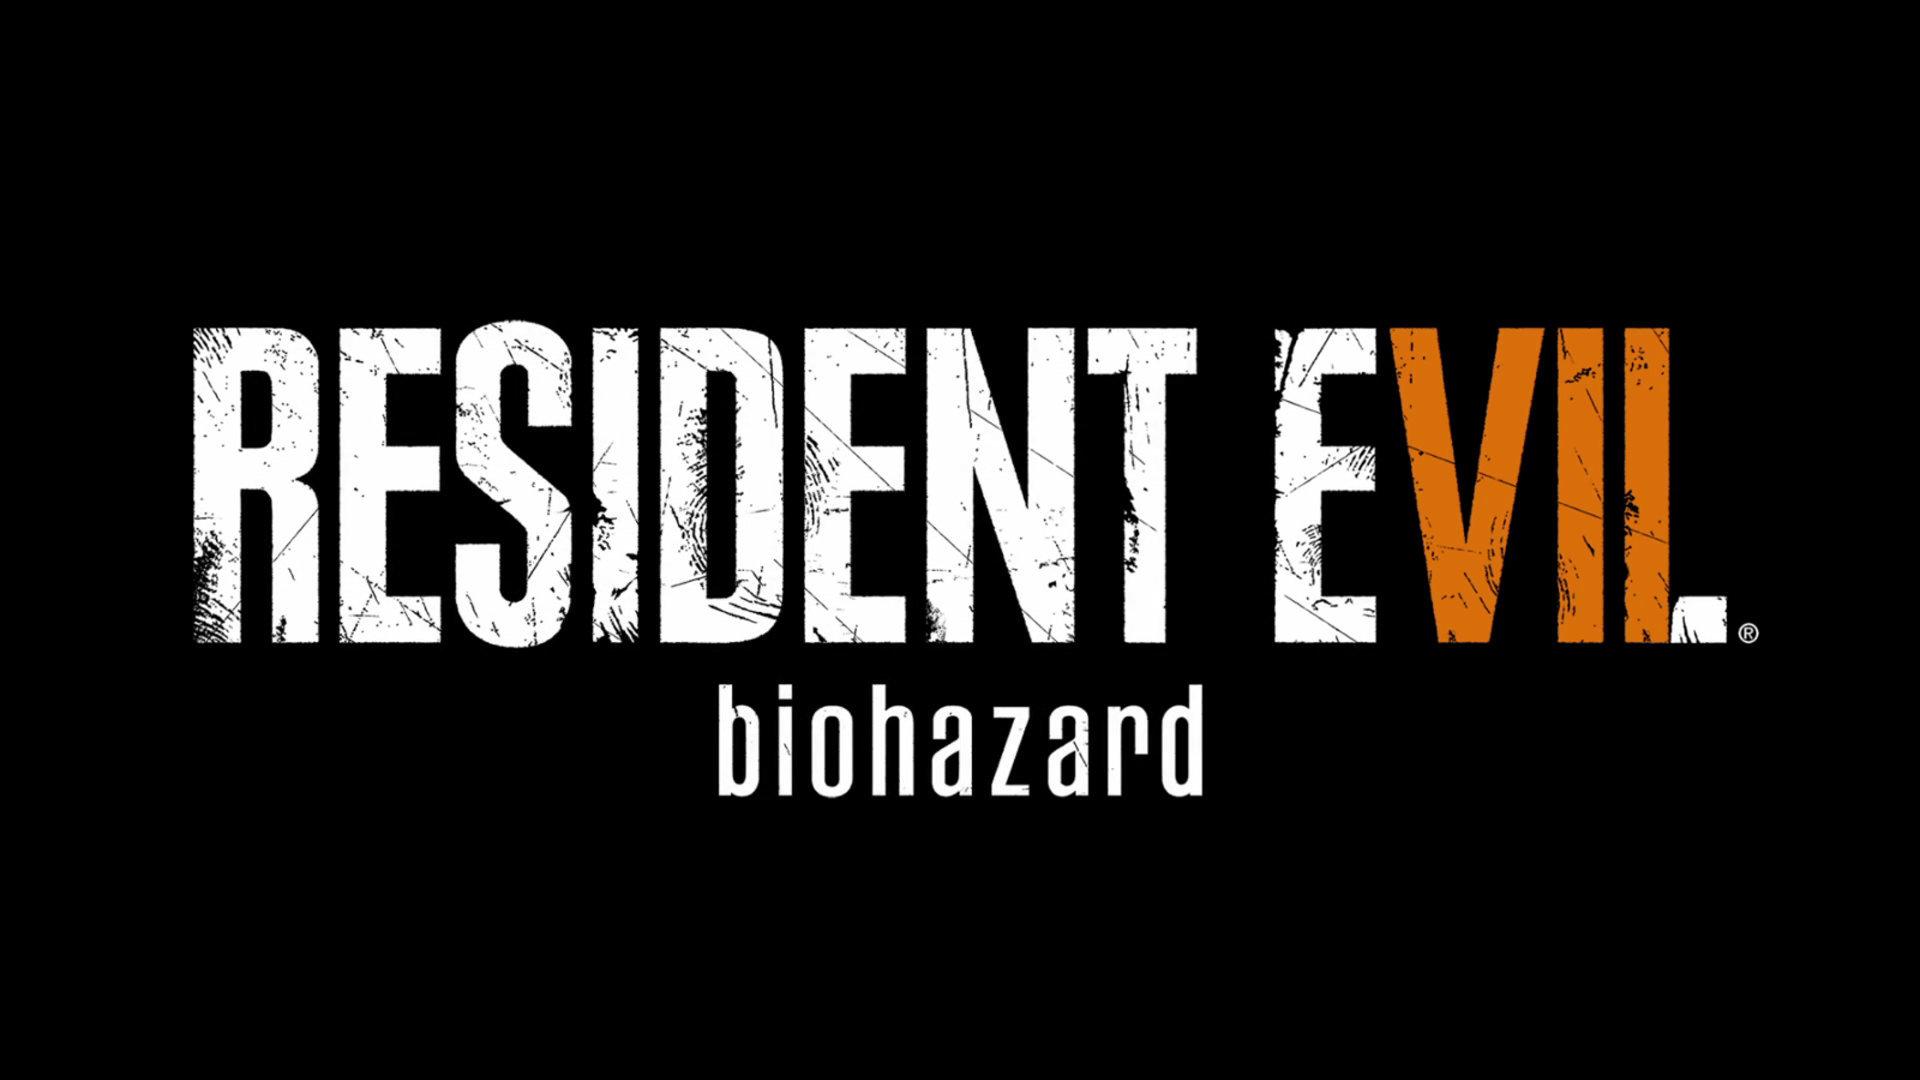 resident evil 7: biohazard wallpapers 1920x1080 full hd (1080p